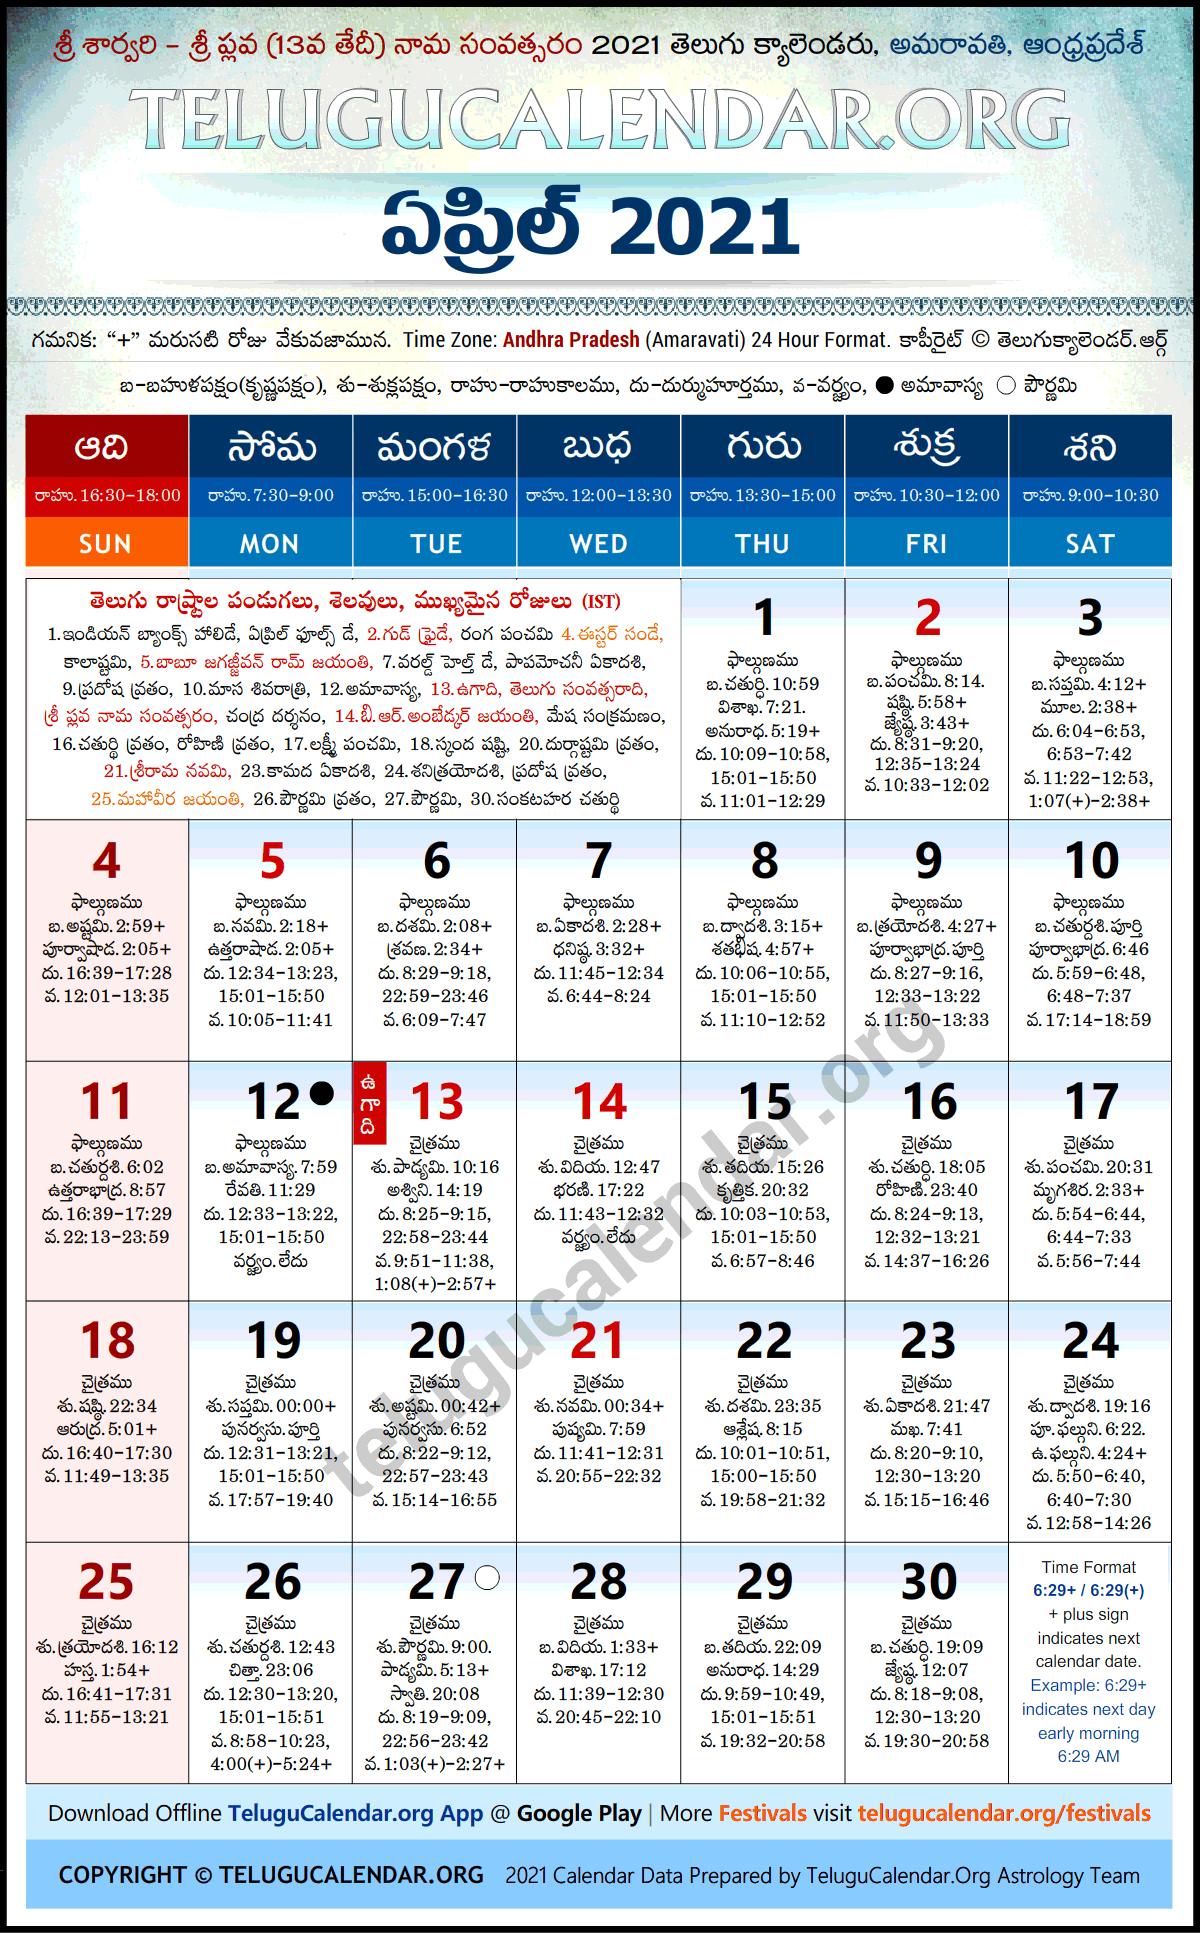 Telugu Calendar 2022 February.Andhra Pradesh 2021 April Telugu Calendar Festivals Holidays